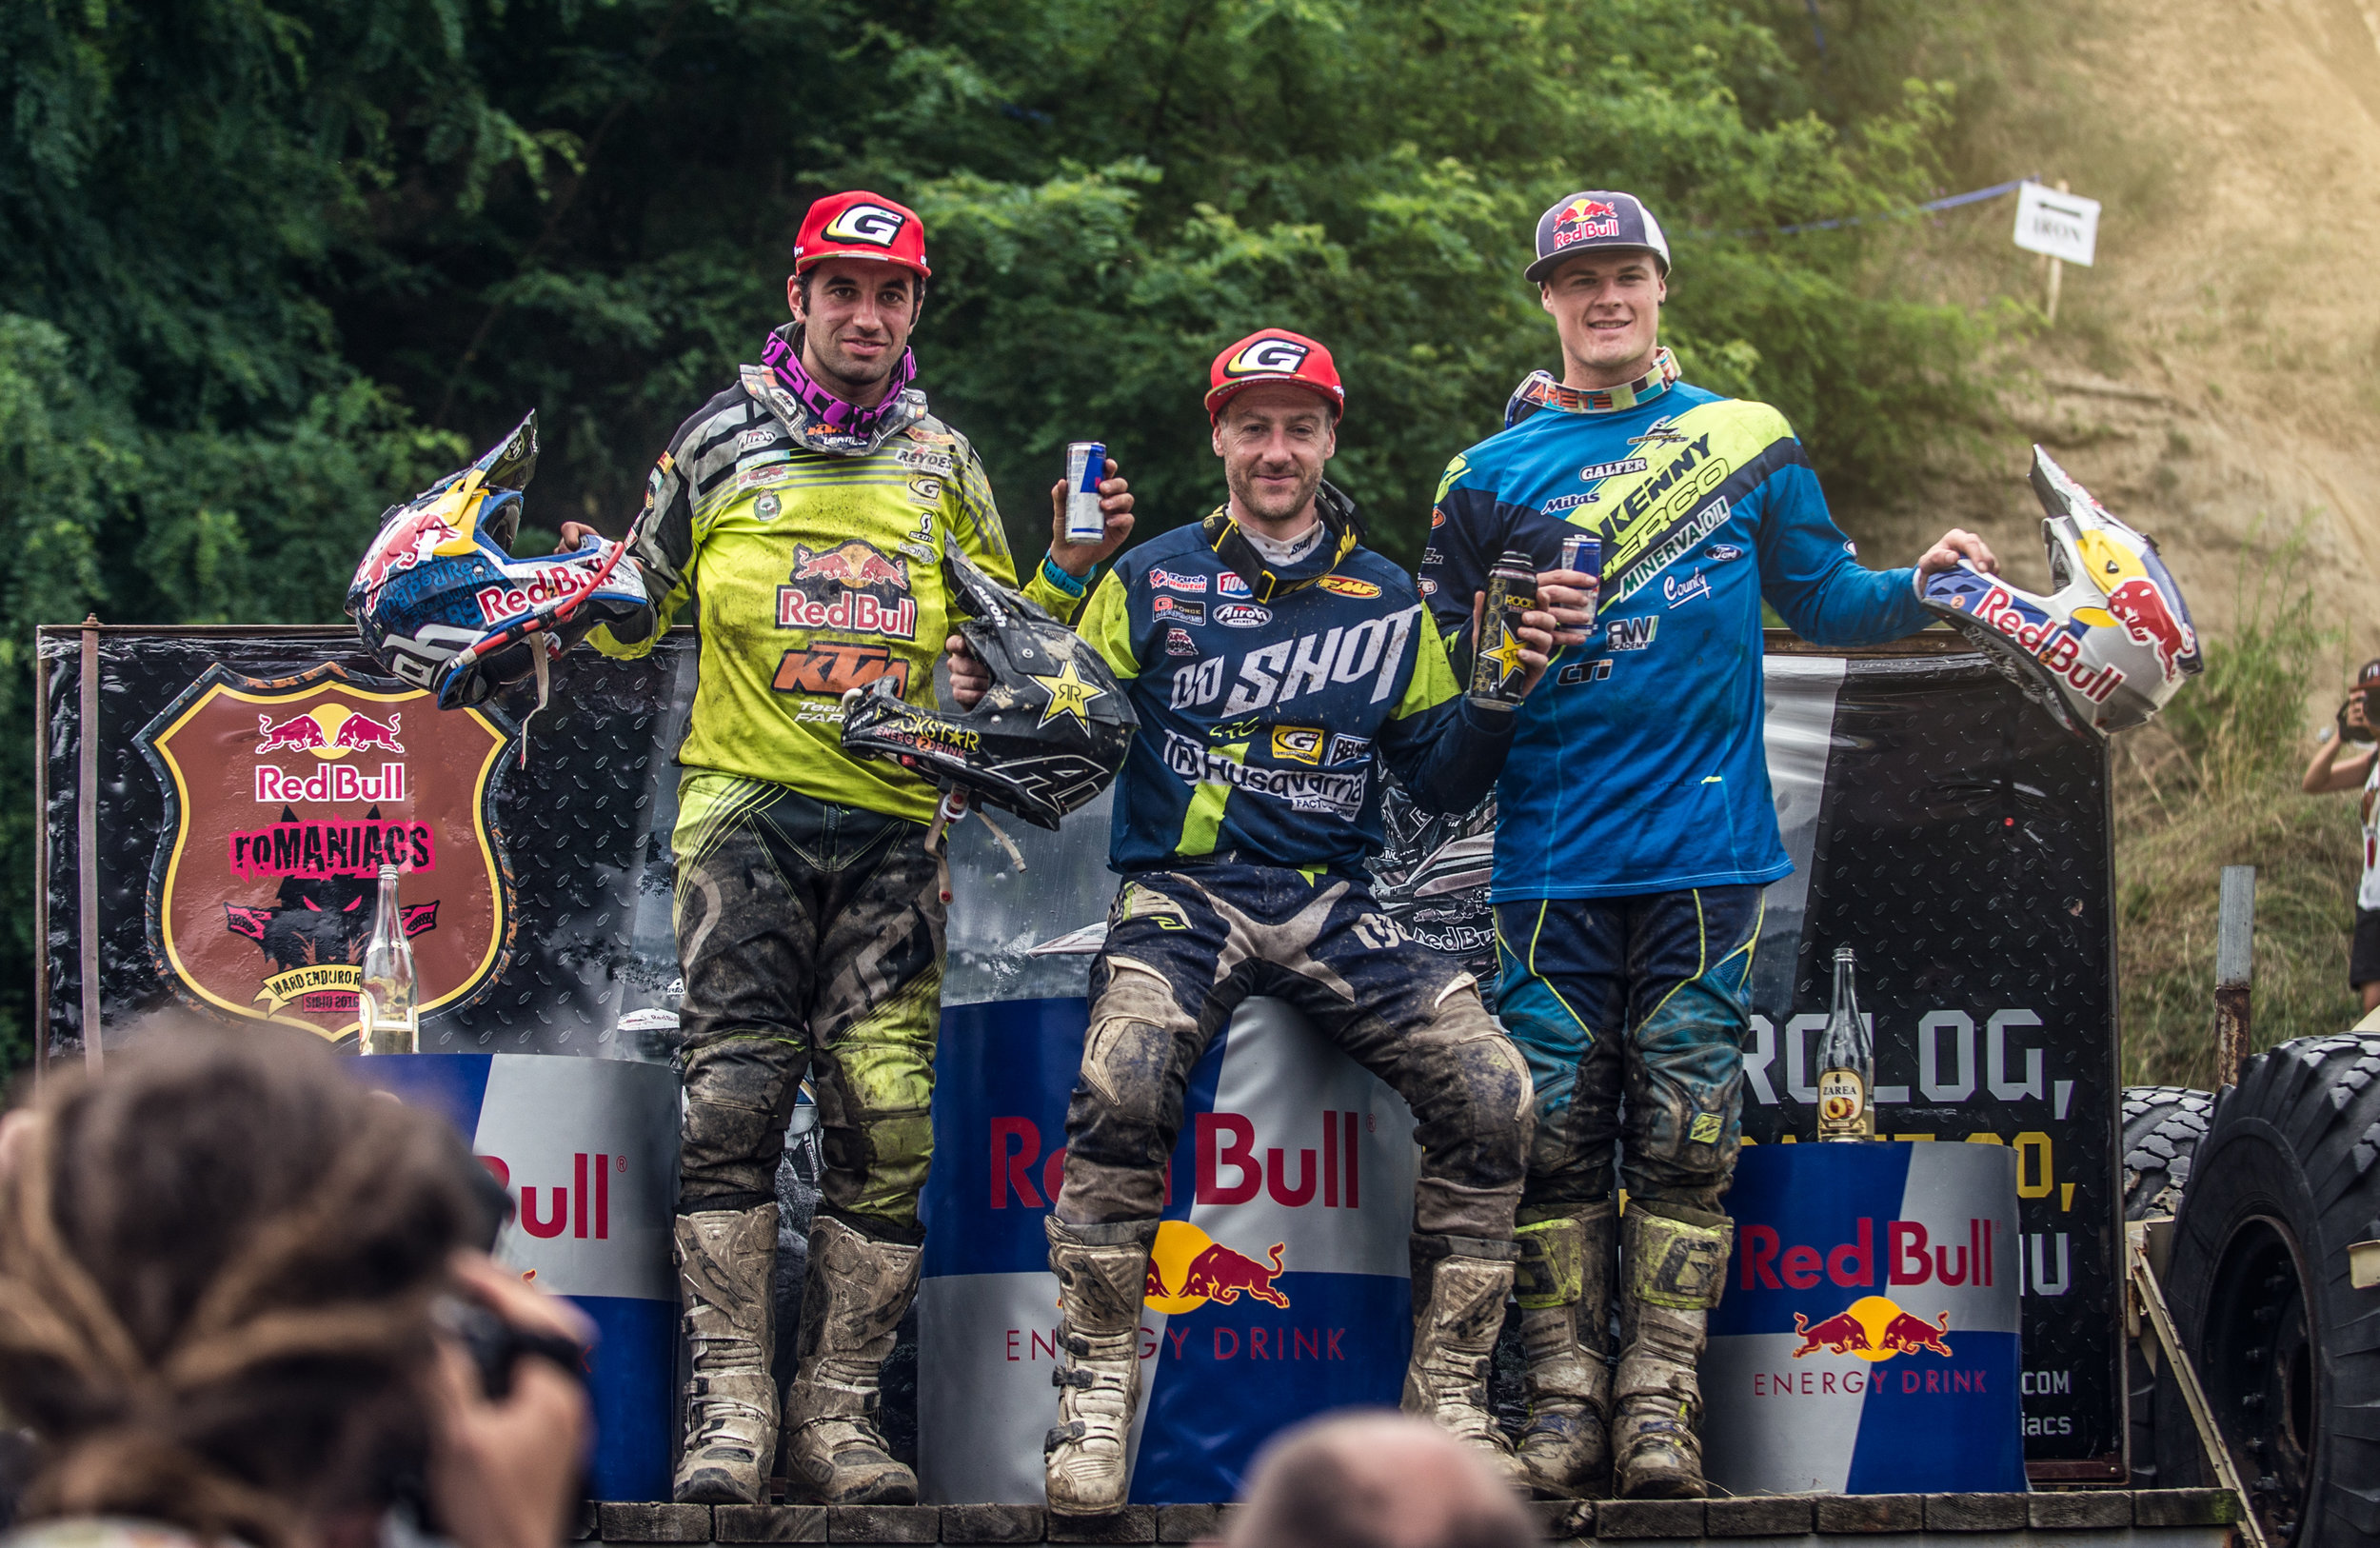 Red Bull Romaniacs 2016-16_AD19920-Edit.jpg